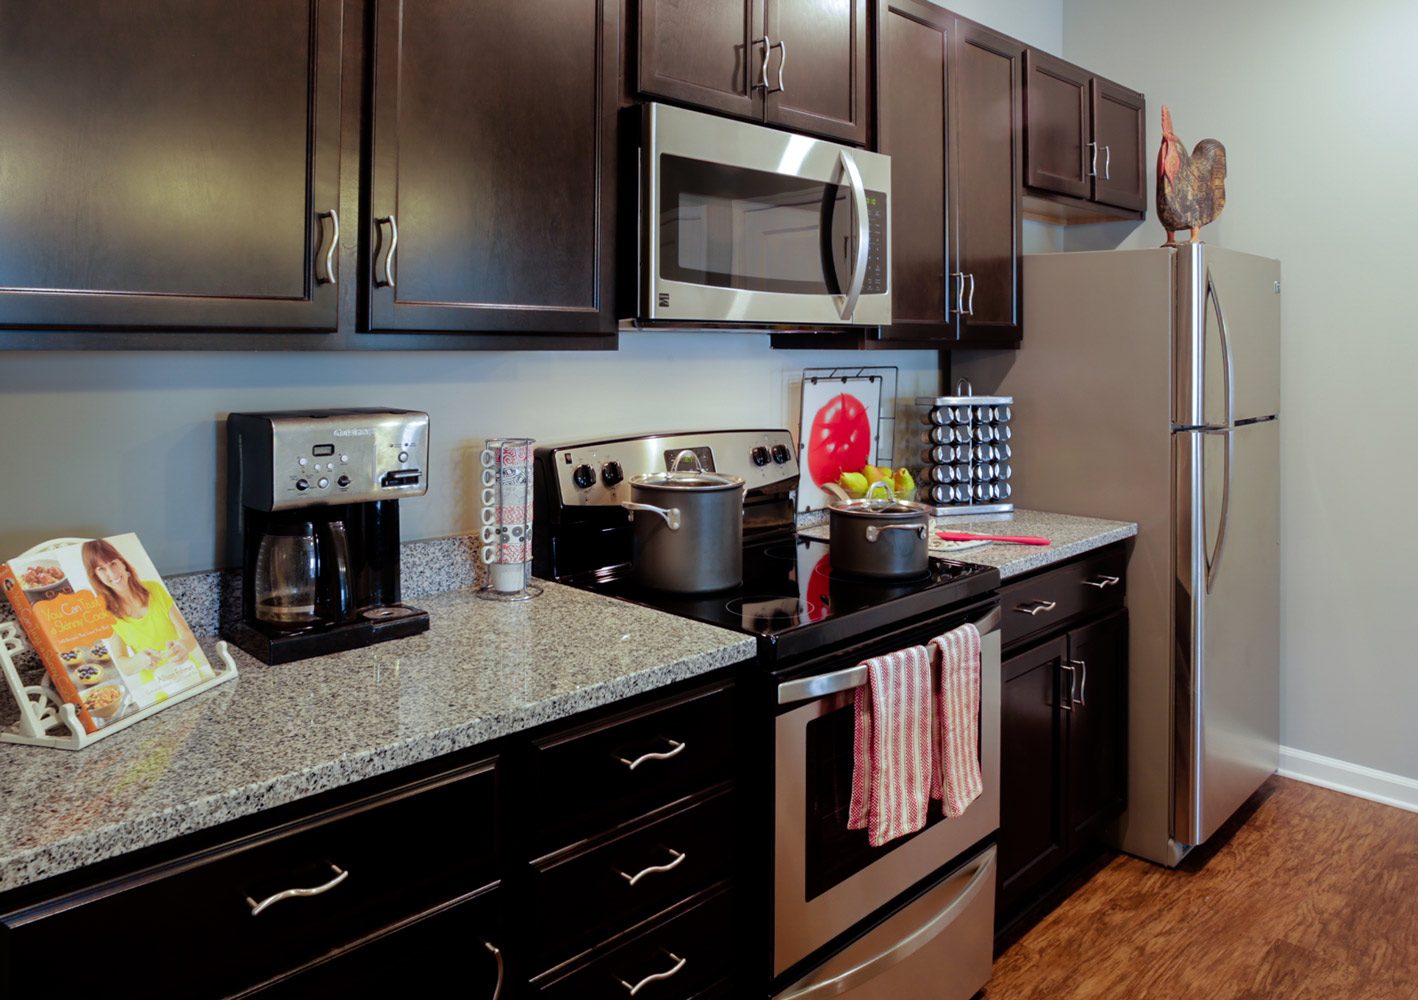 Kitchen at The Watermark Apartments in Norfolk, Virginia